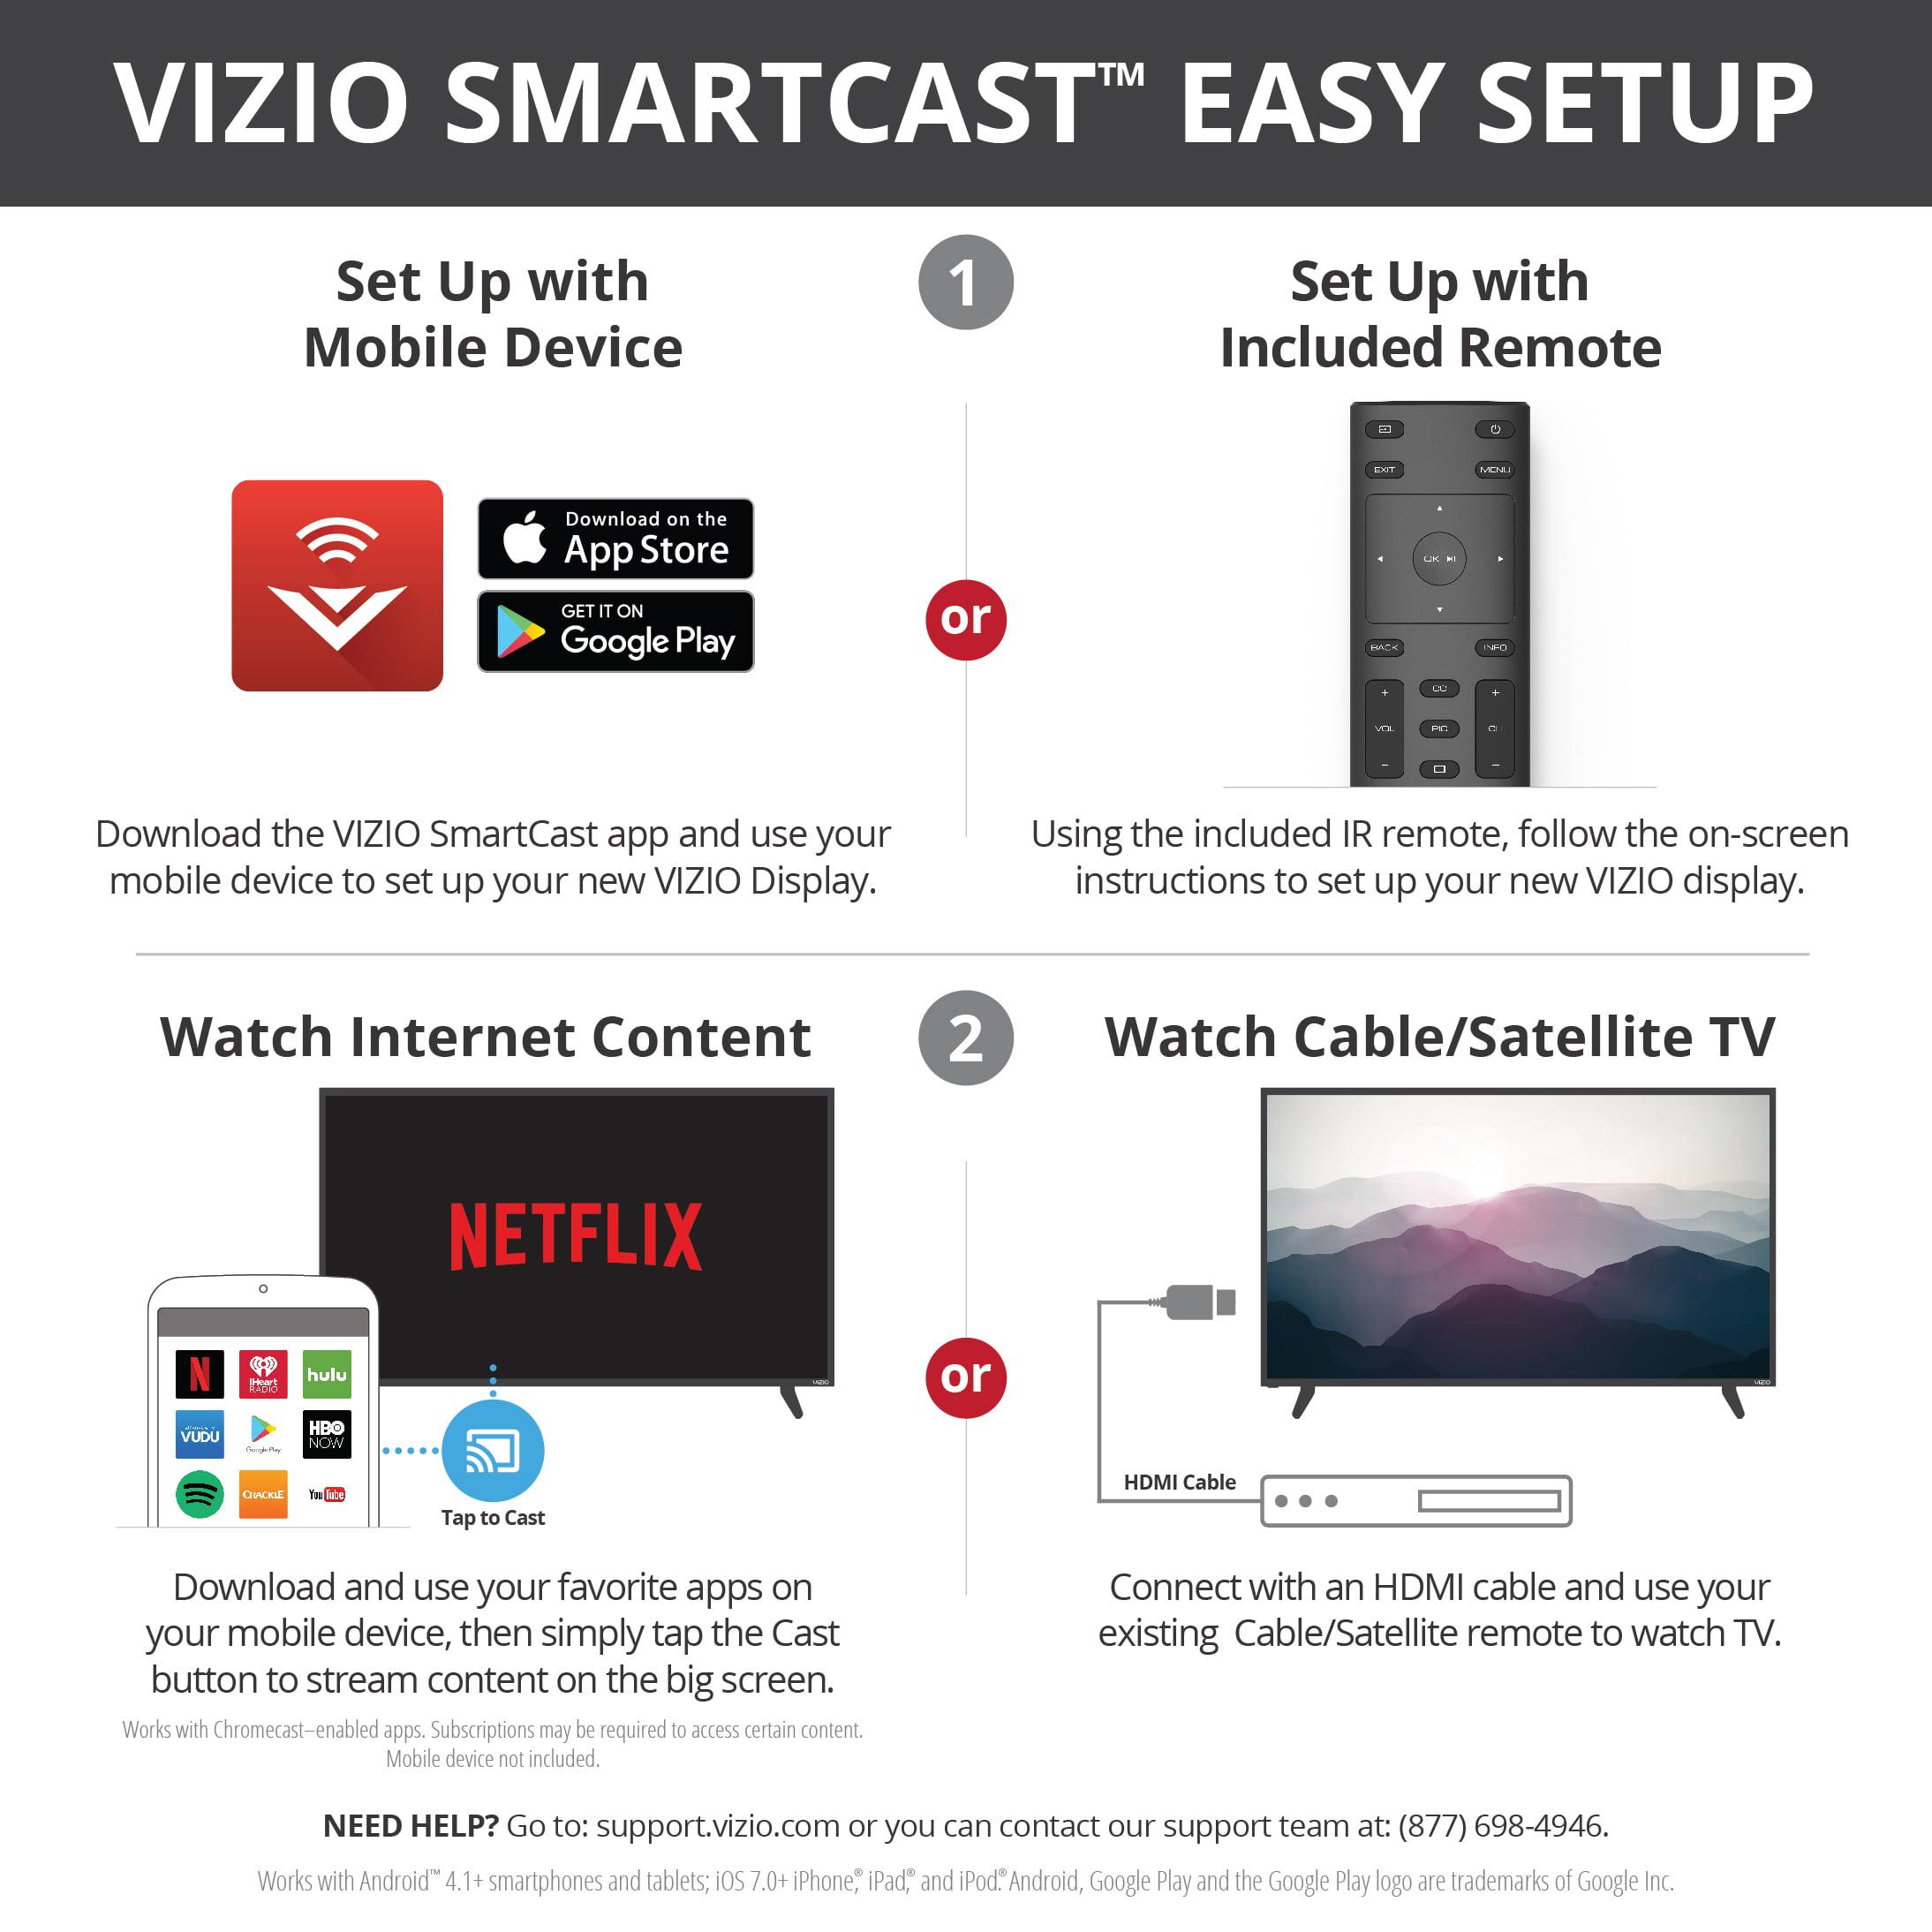 Vizio Smartcast E Series 60 Class Diag Ultra Hd Hdr Xled A Cat 5 Wiring Diagram Display E60 E3